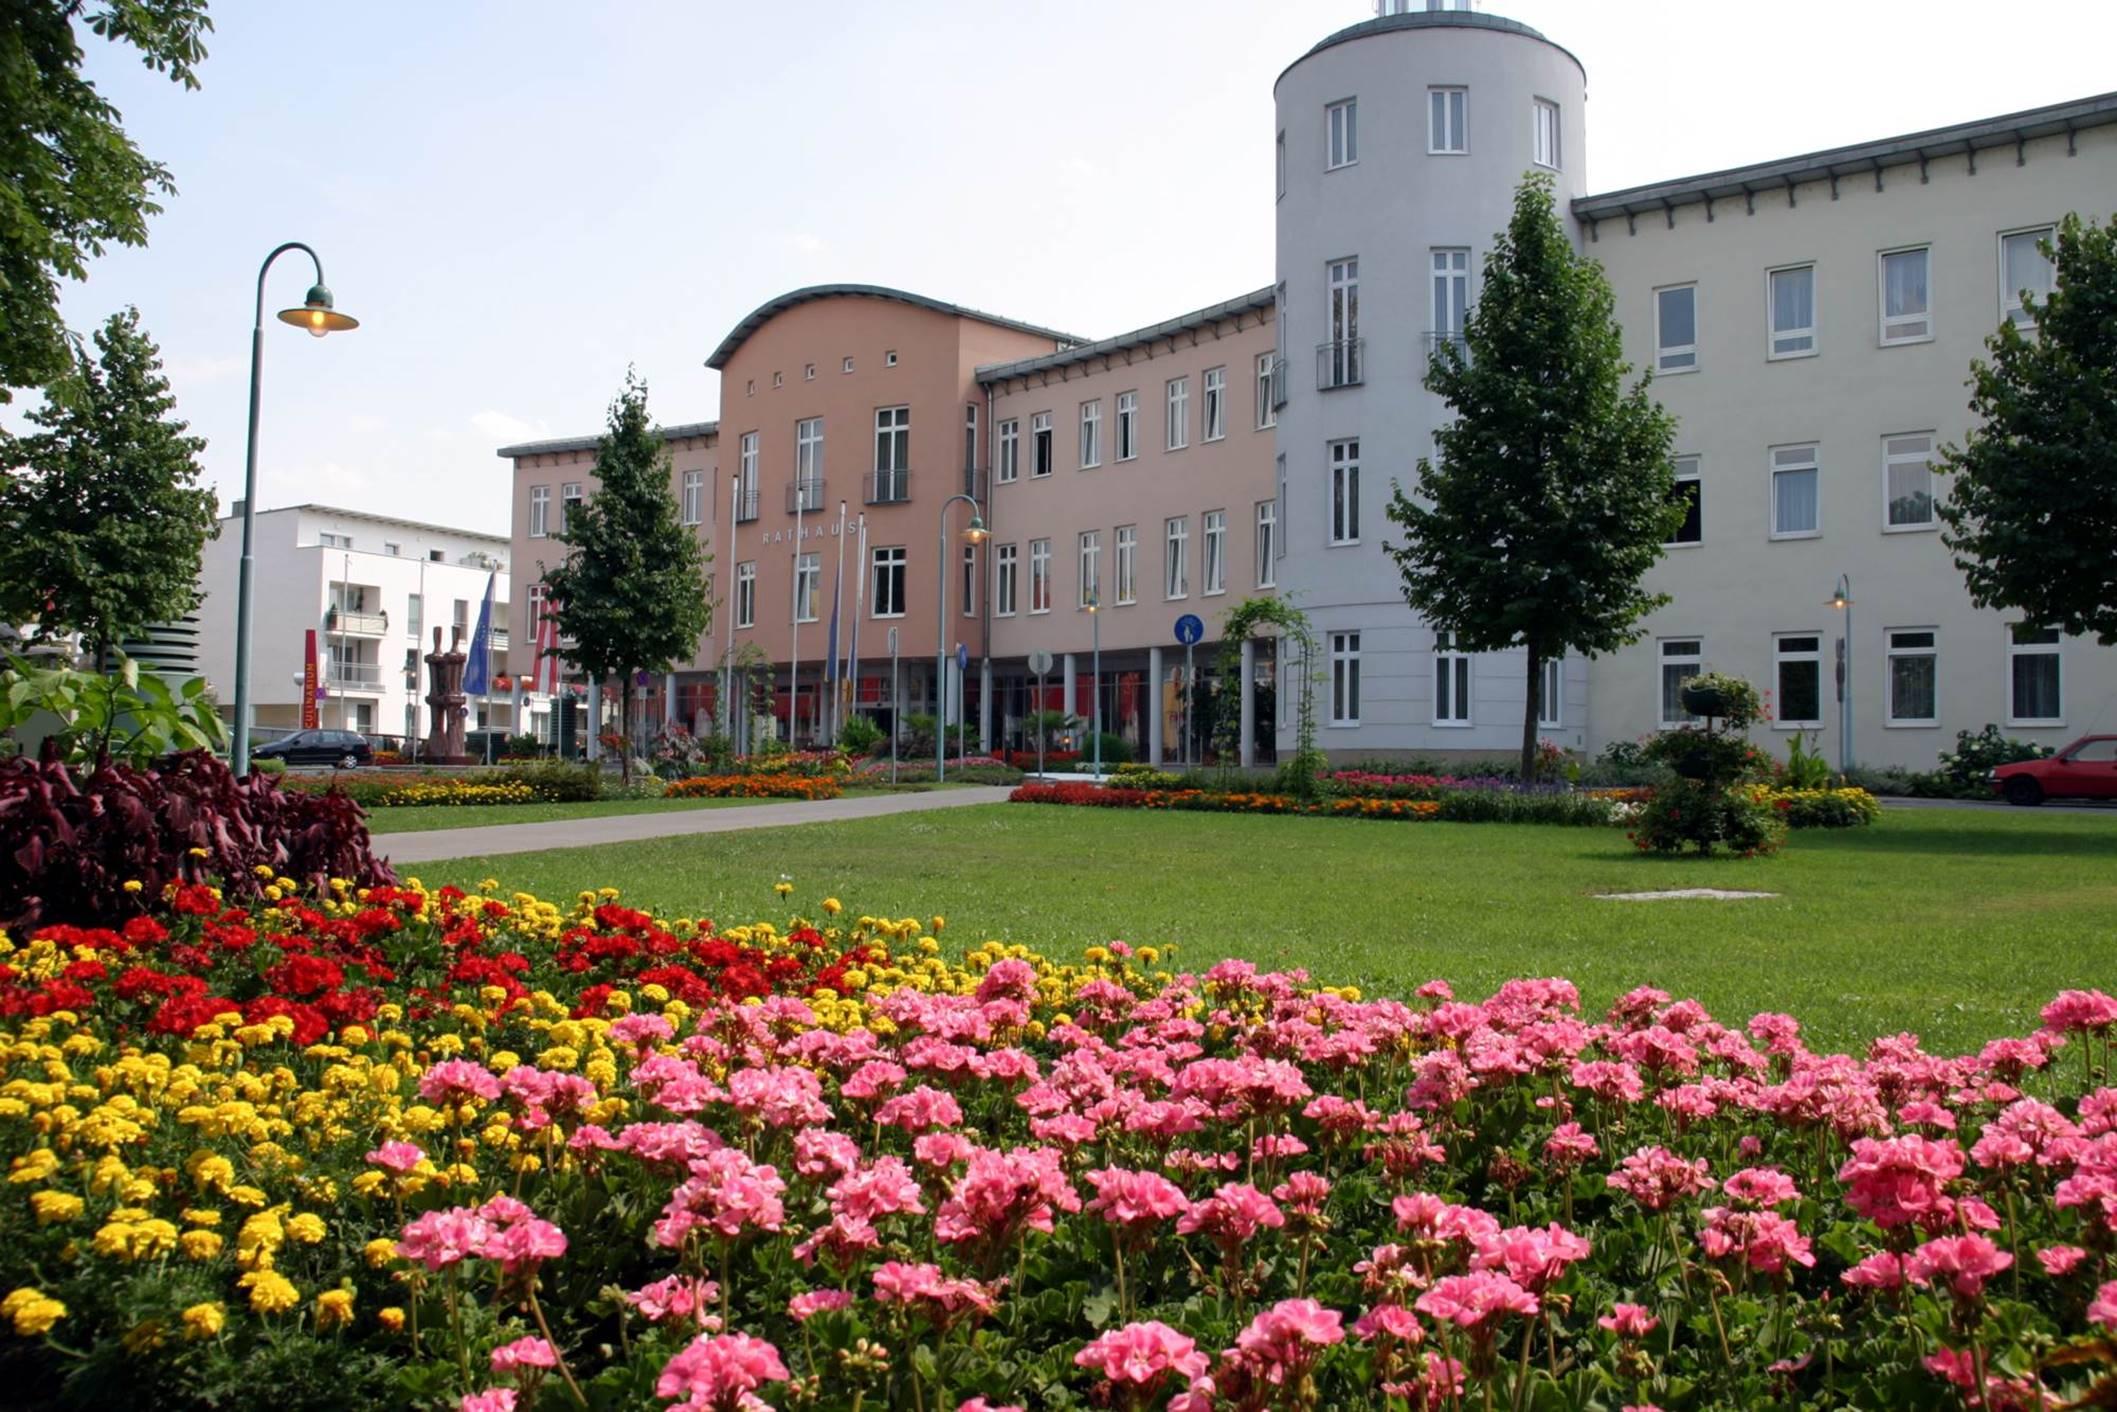 City Info: Schwechat 1